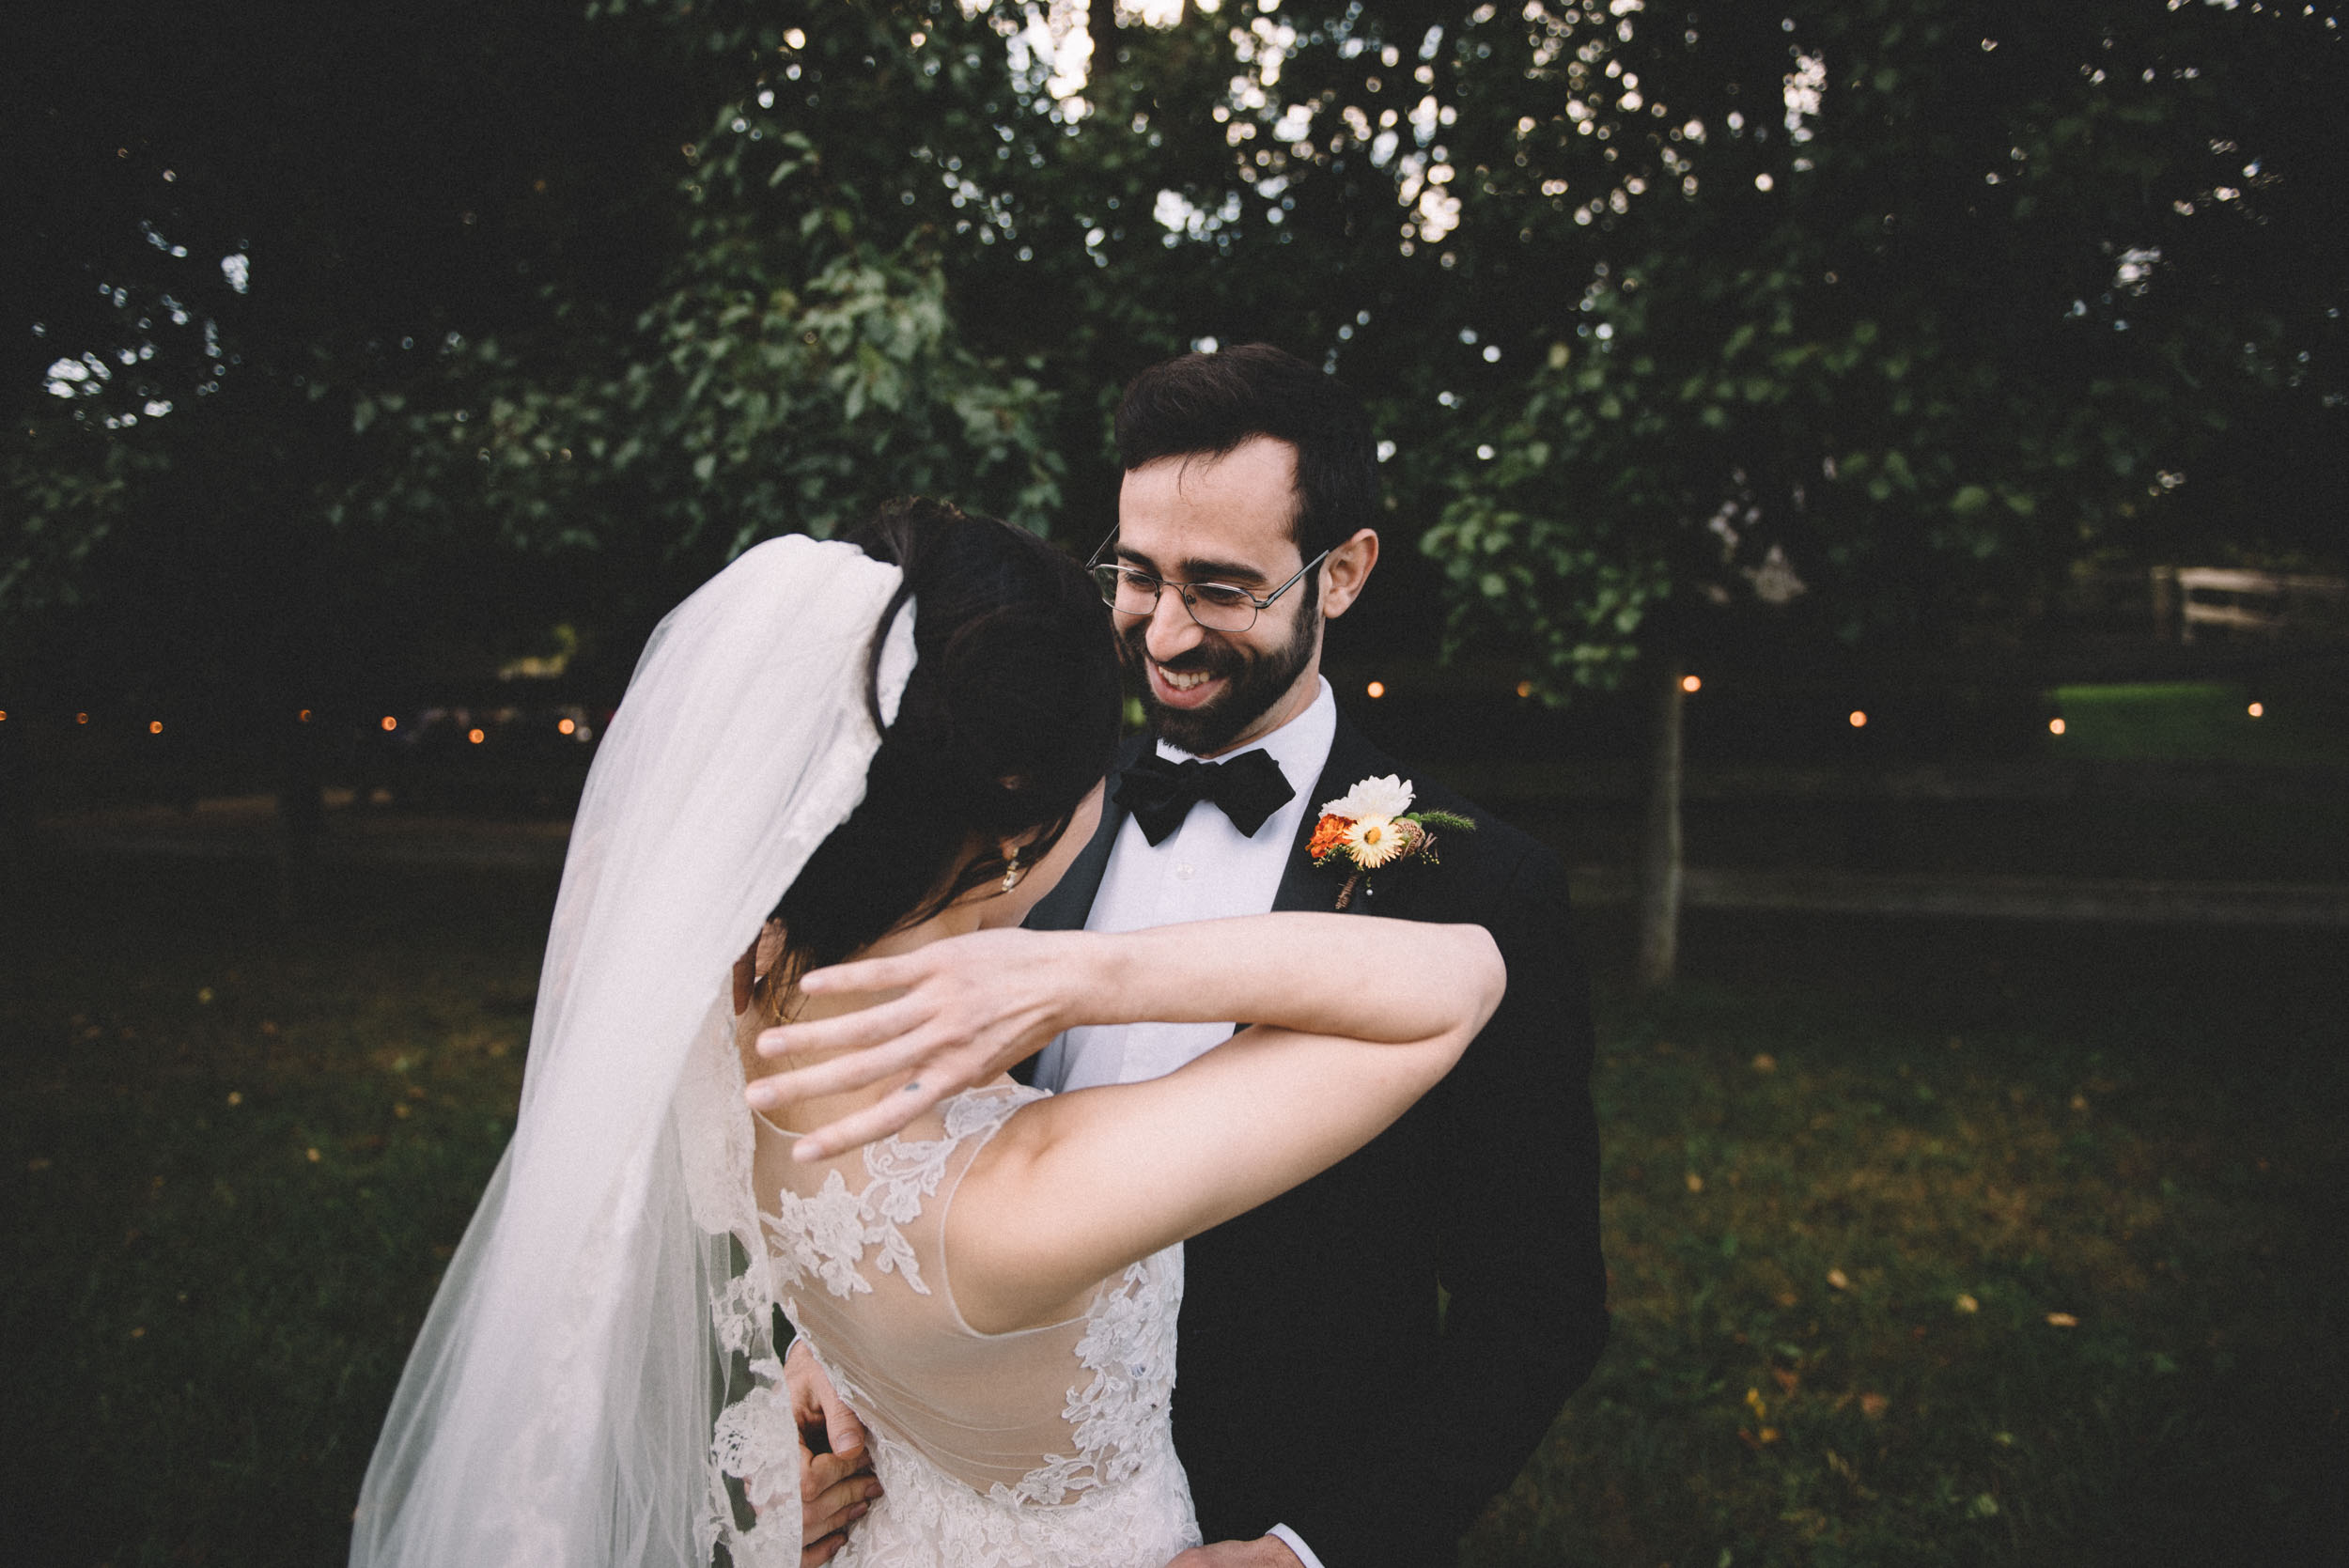 poolseville-maryland-wedding-photographer-6.jpg